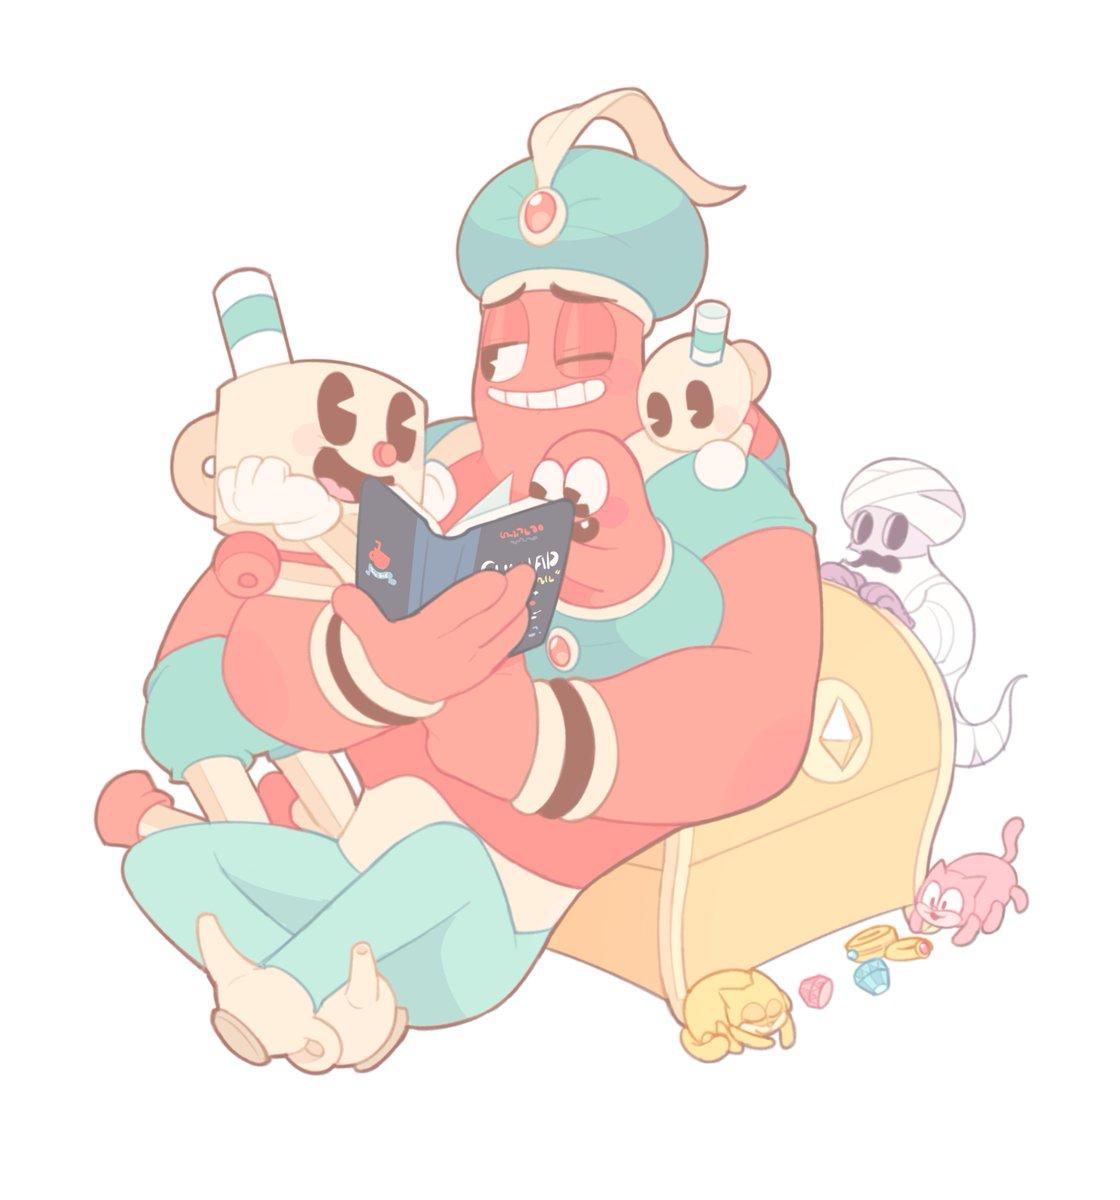 Genie Daddy #Cuphead<br>http://pic.twitter.com/oSJF9iVwBf